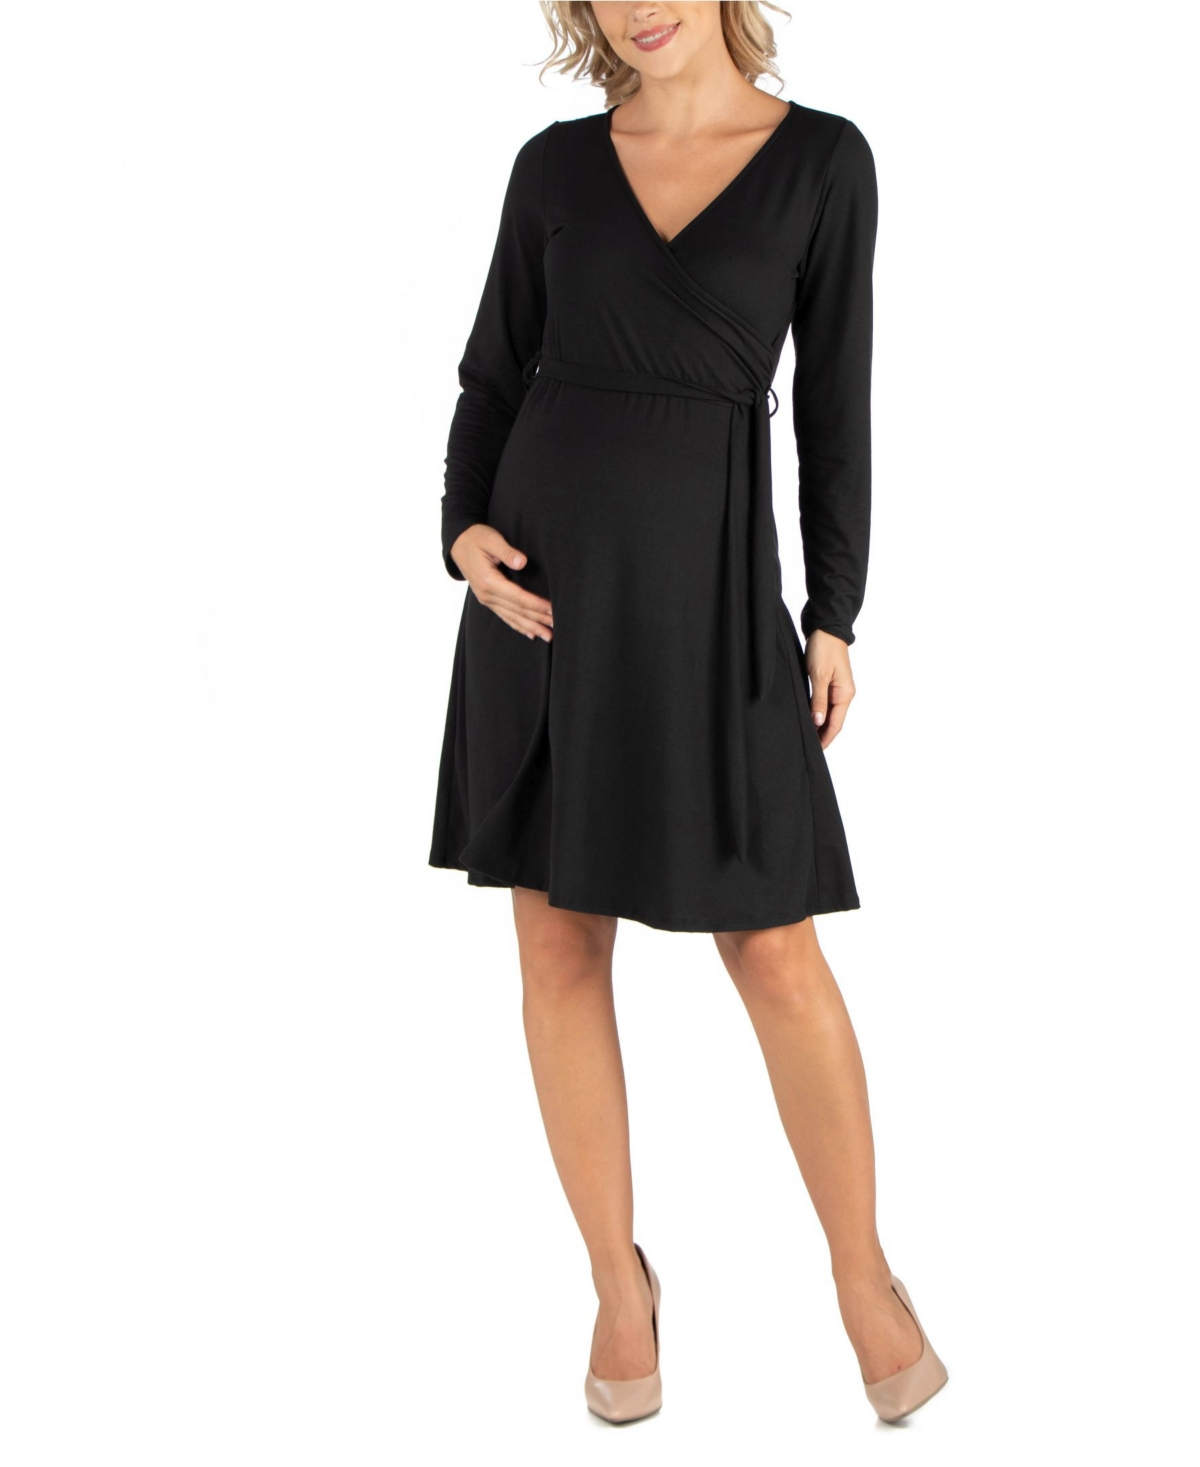 24Seven Comfort Apparel Womens Knee Length Long Sleeve Maternity Wrap Dress